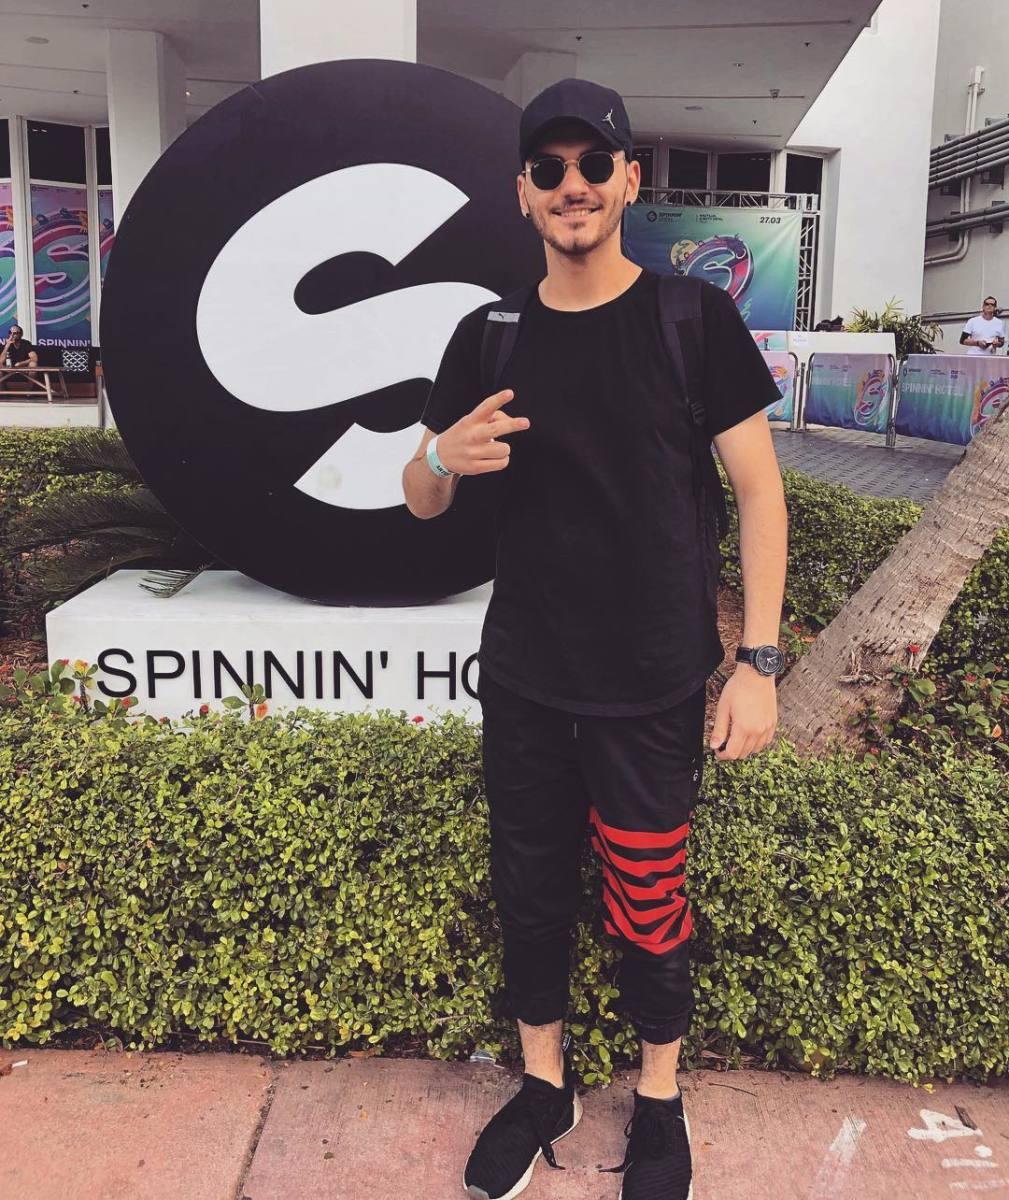 Jyye @ Spinnin' Hotel (Nautilus Hotel) in Miami for Miami Music Week